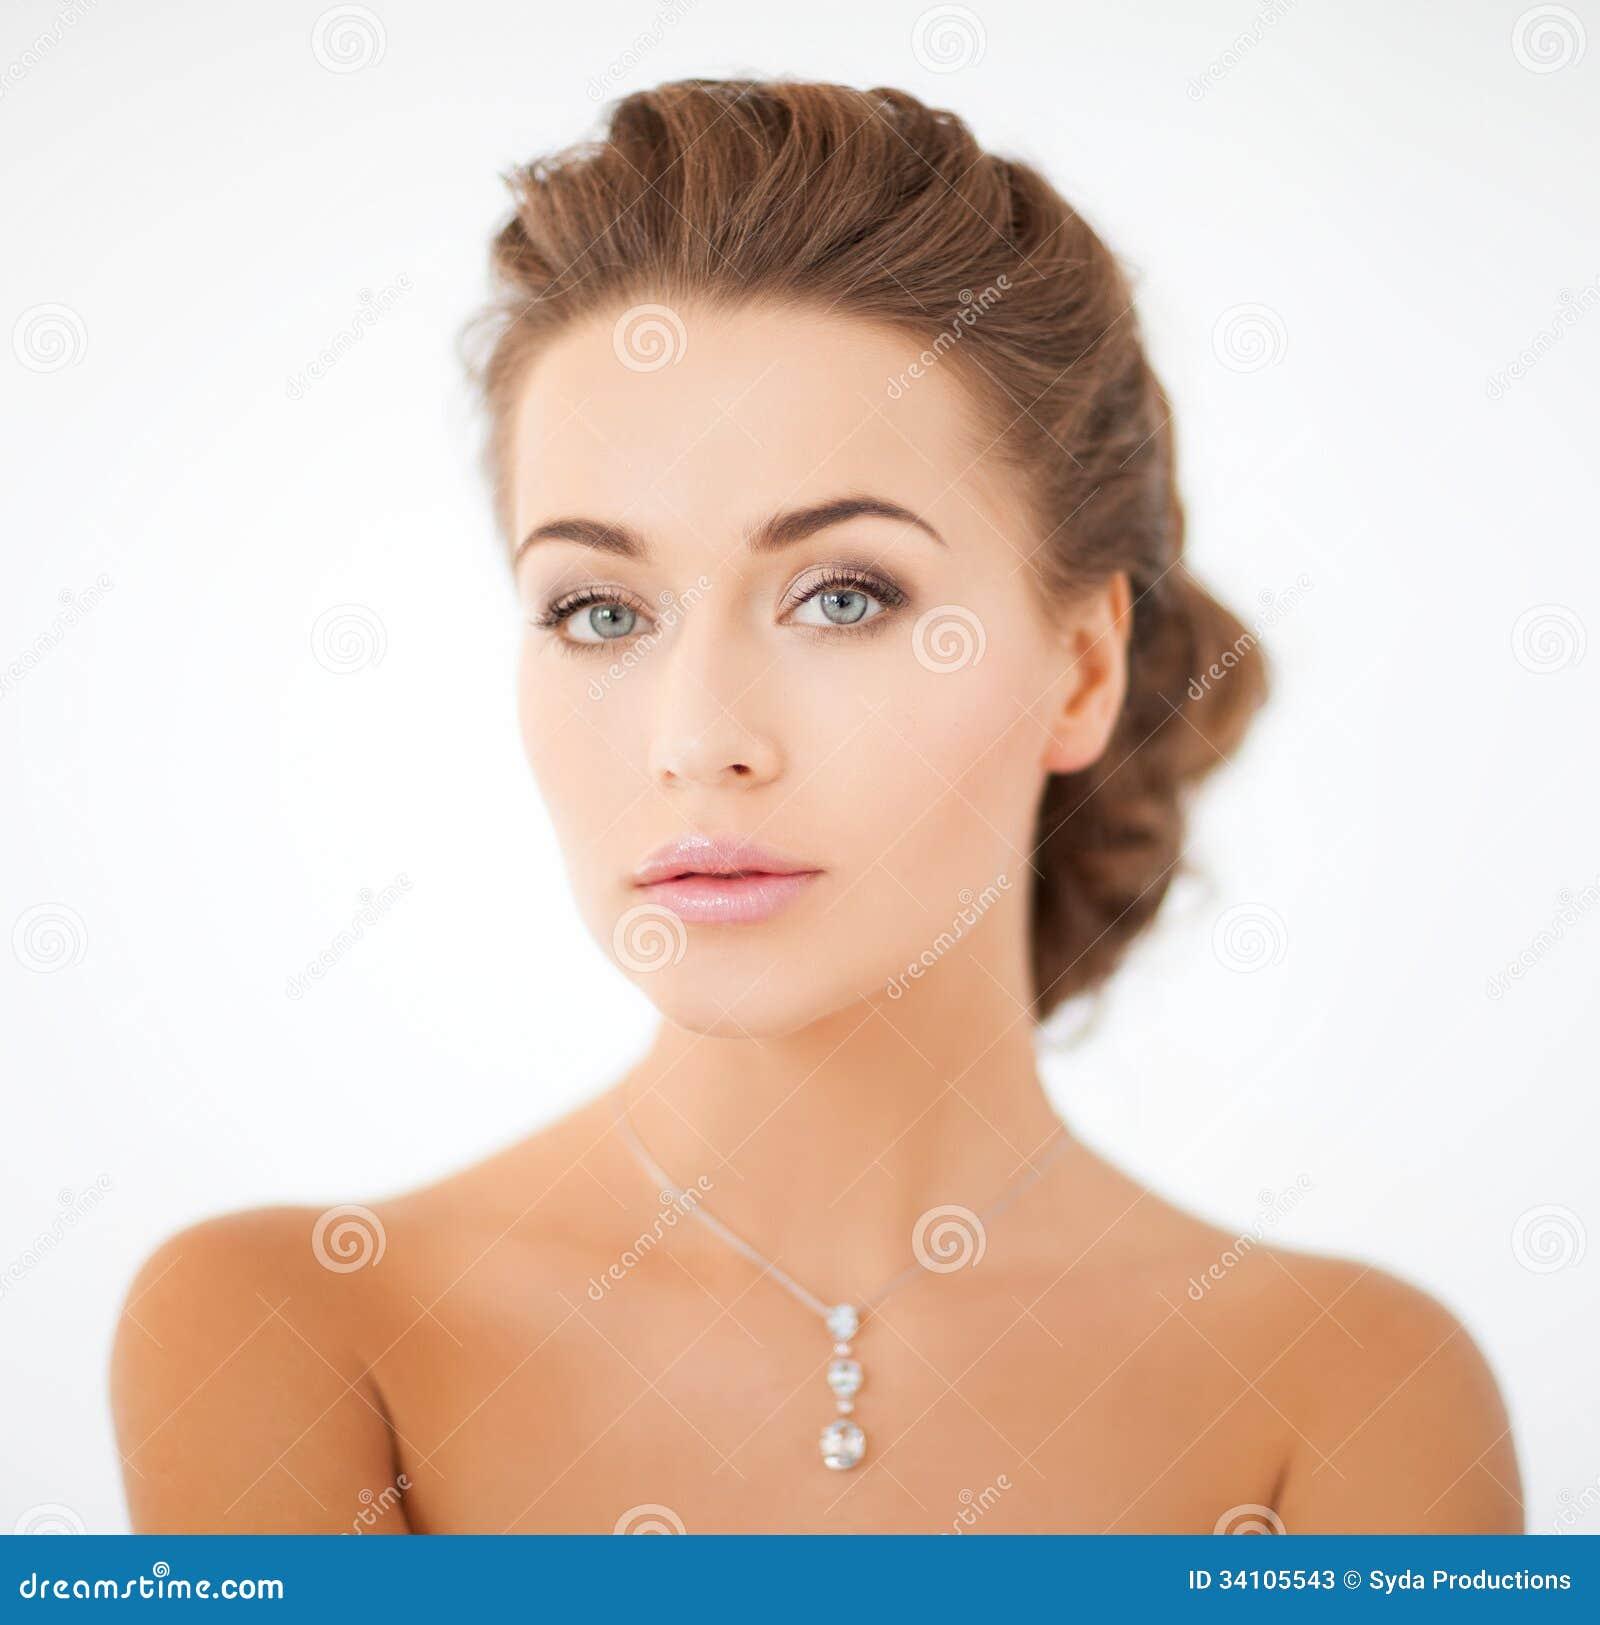 Woman wearing shiny diamond pendant stock image image of woman wearing shiny diamond pendant stock image image of advertisement luxuries 34105543 aloadofball Gallery